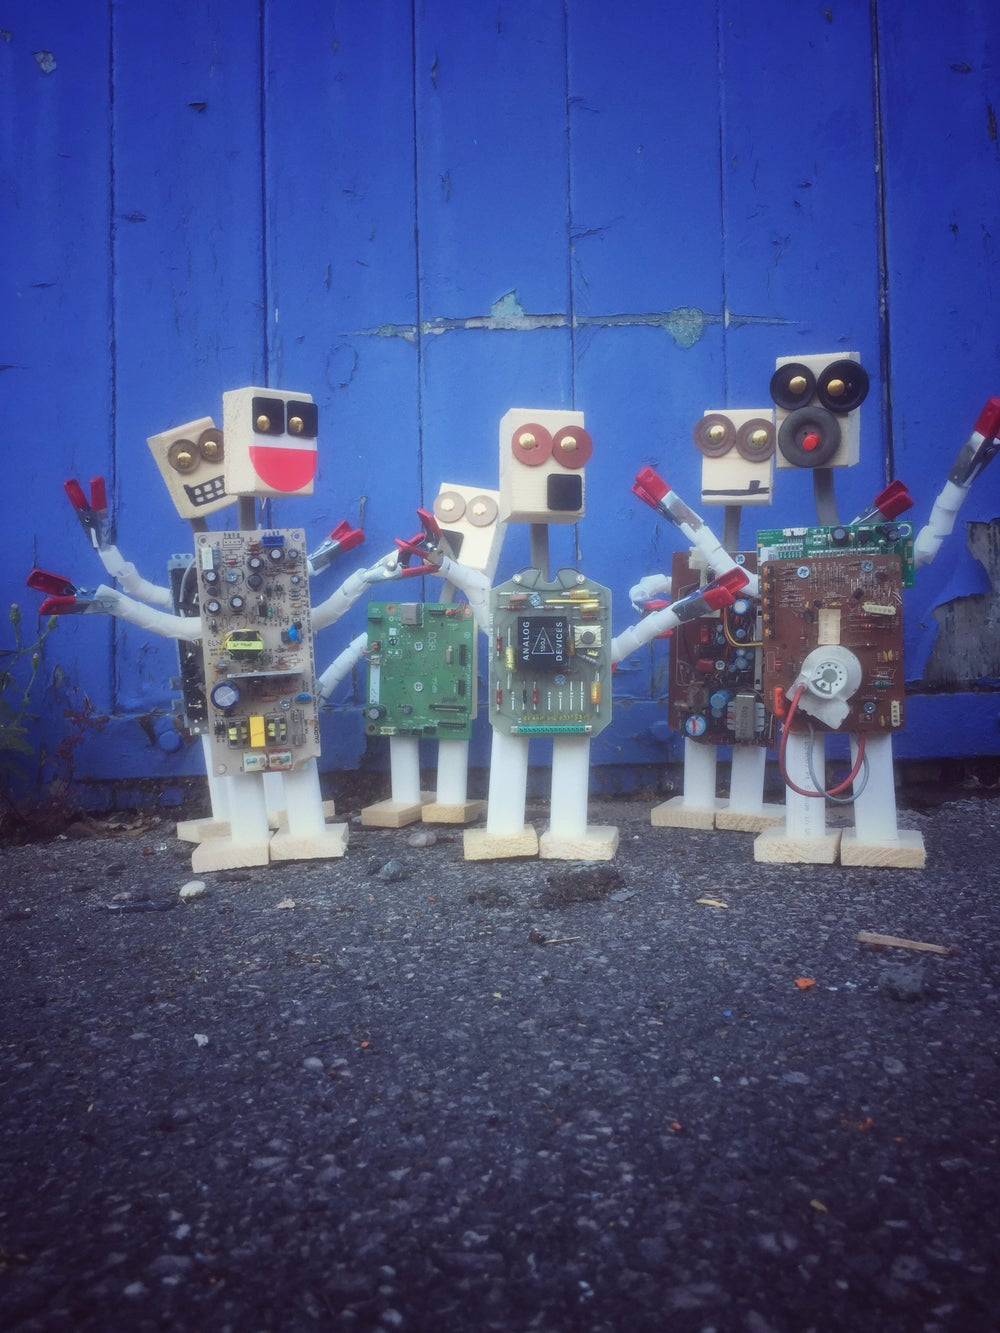 Image of Woody 'bots